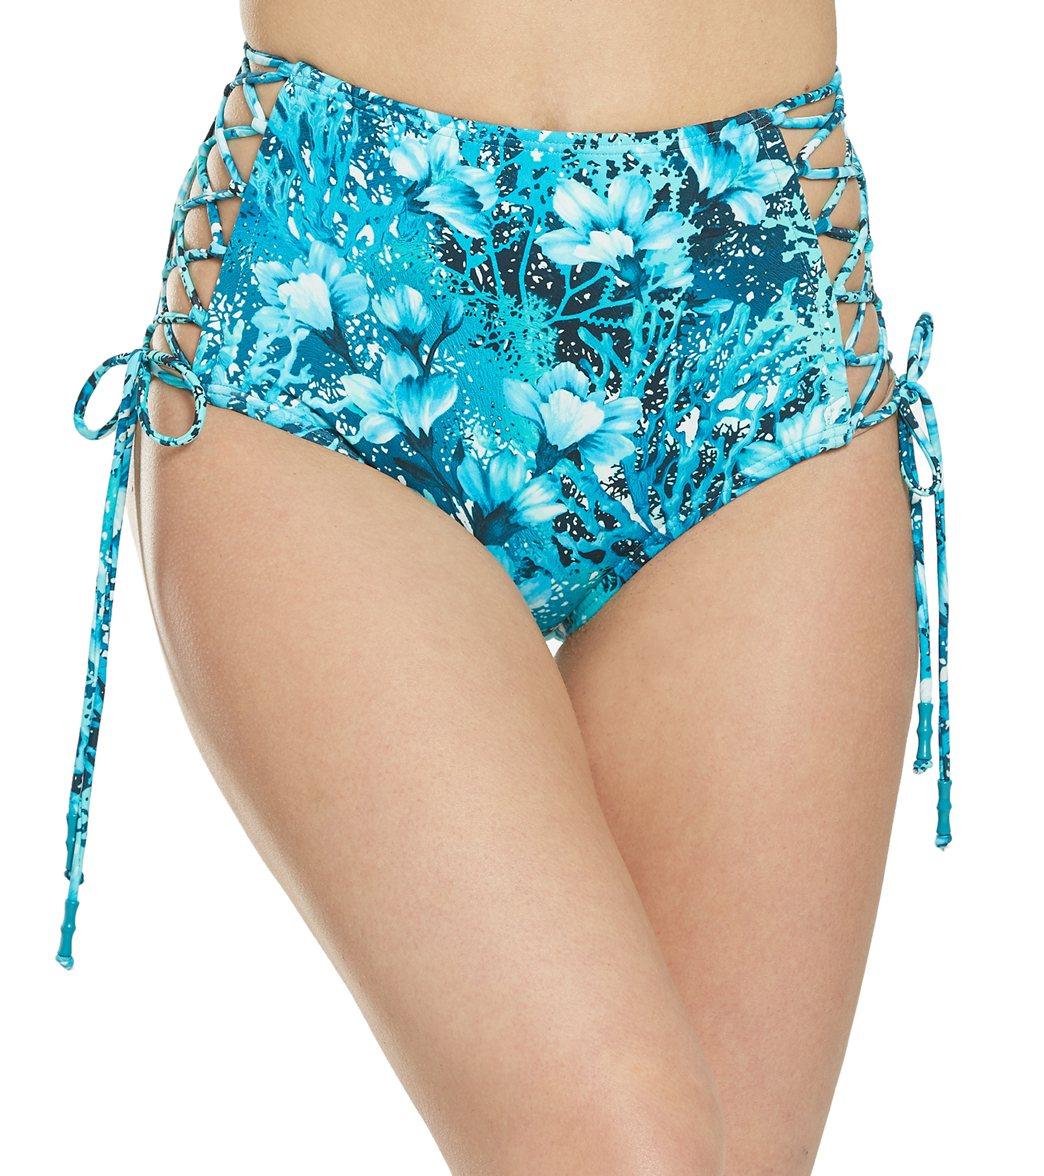 Carmen Marc Valvo Coral Reef Garden Side Tie High Waisted Bikini Bottom